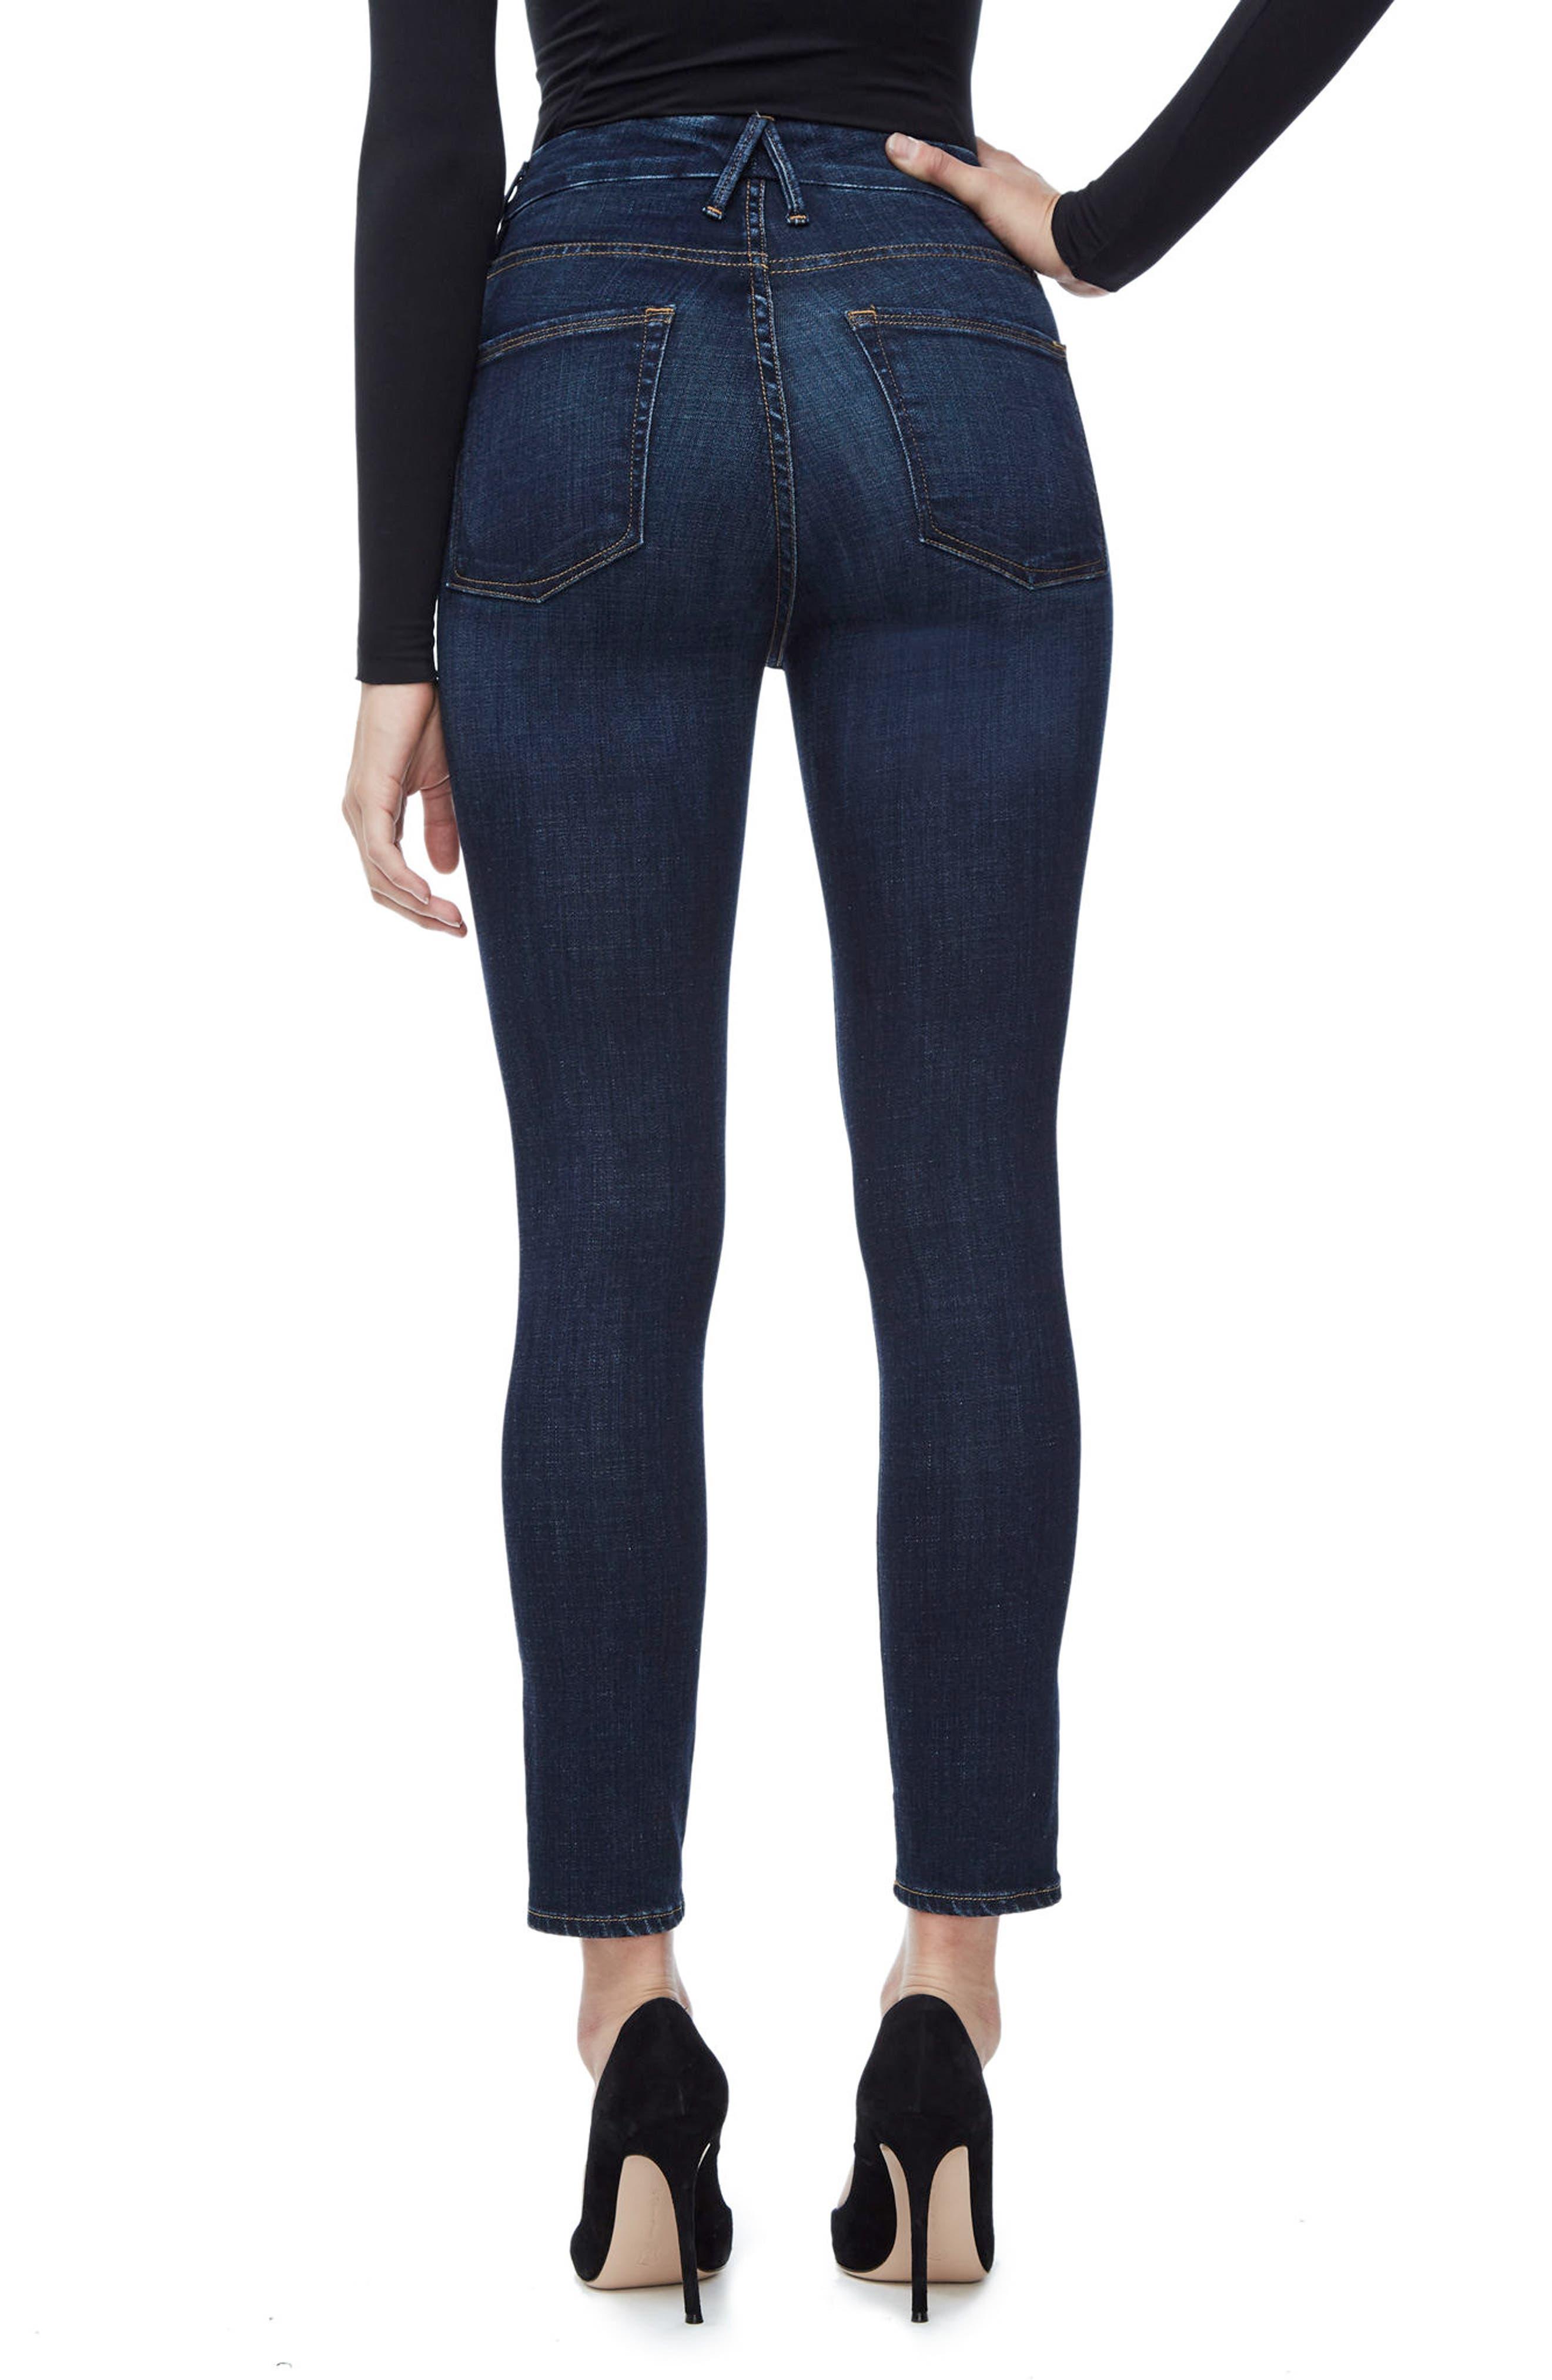 Alternate Image 2  - Good American Good Legs High Waist Ankle Skinny Jeans (Blue 089) (Regular & Plus Size)